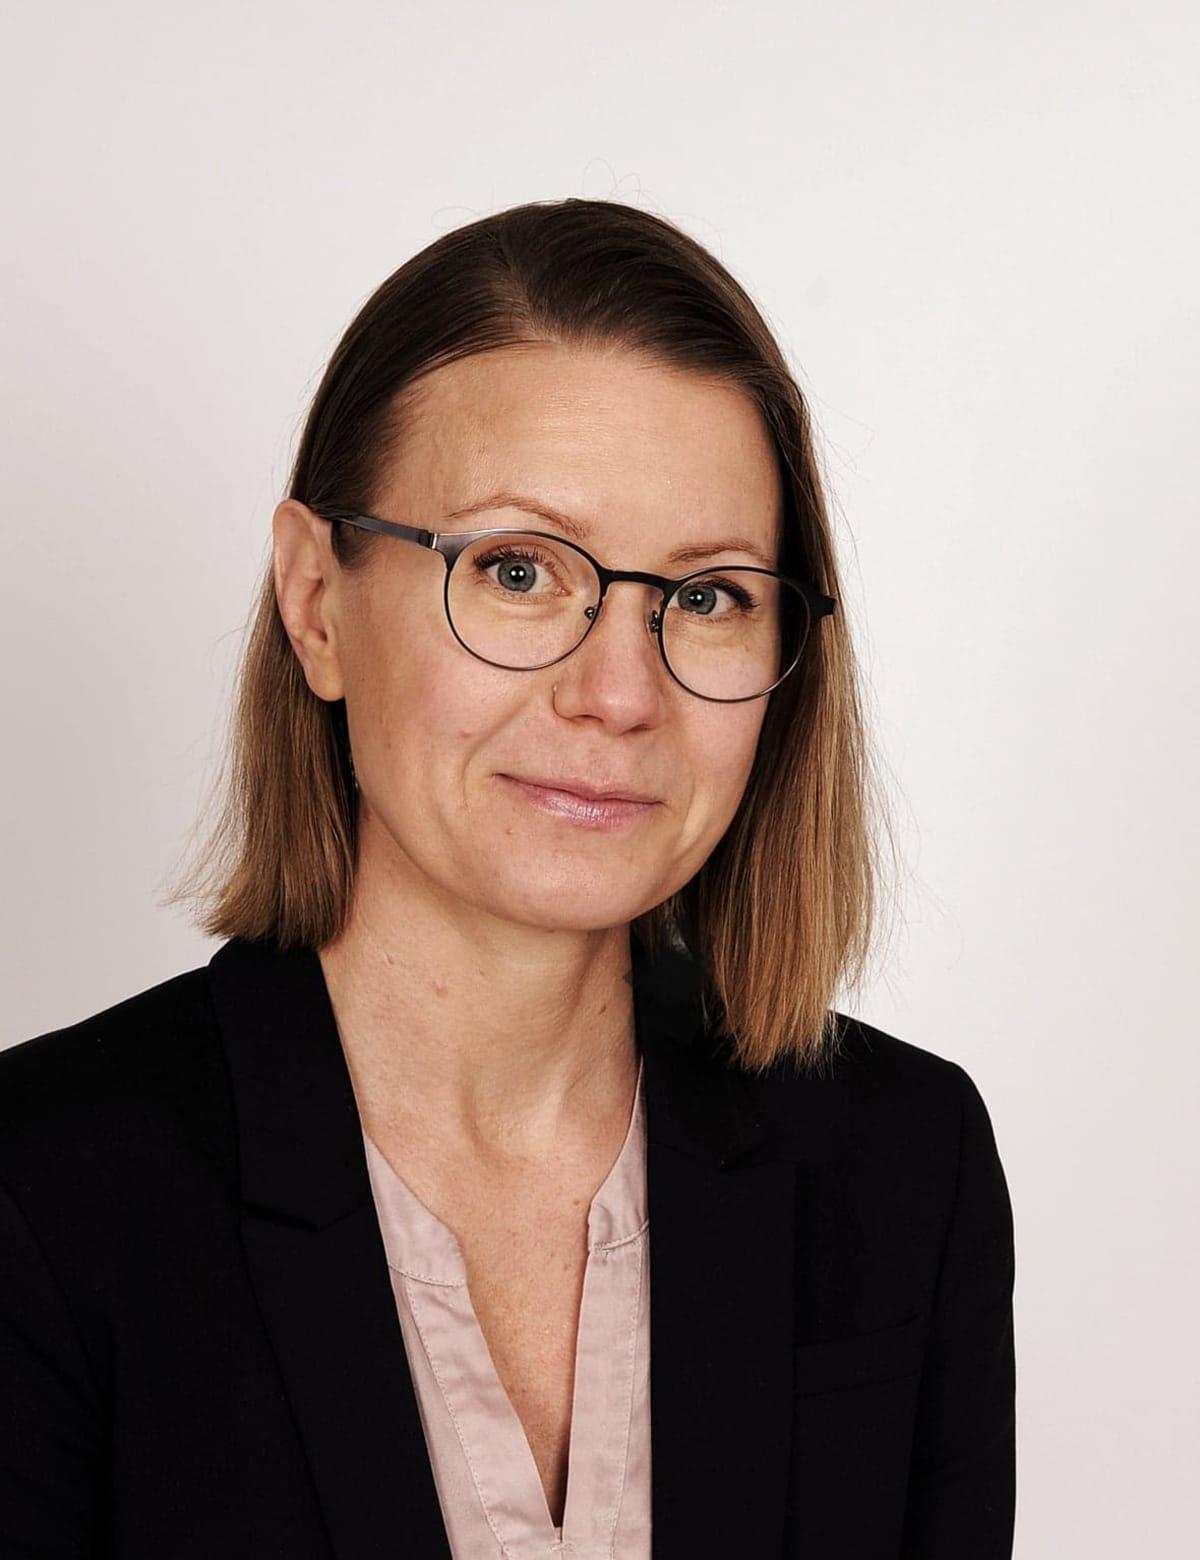 projektitutkija Julia Kuusiholma